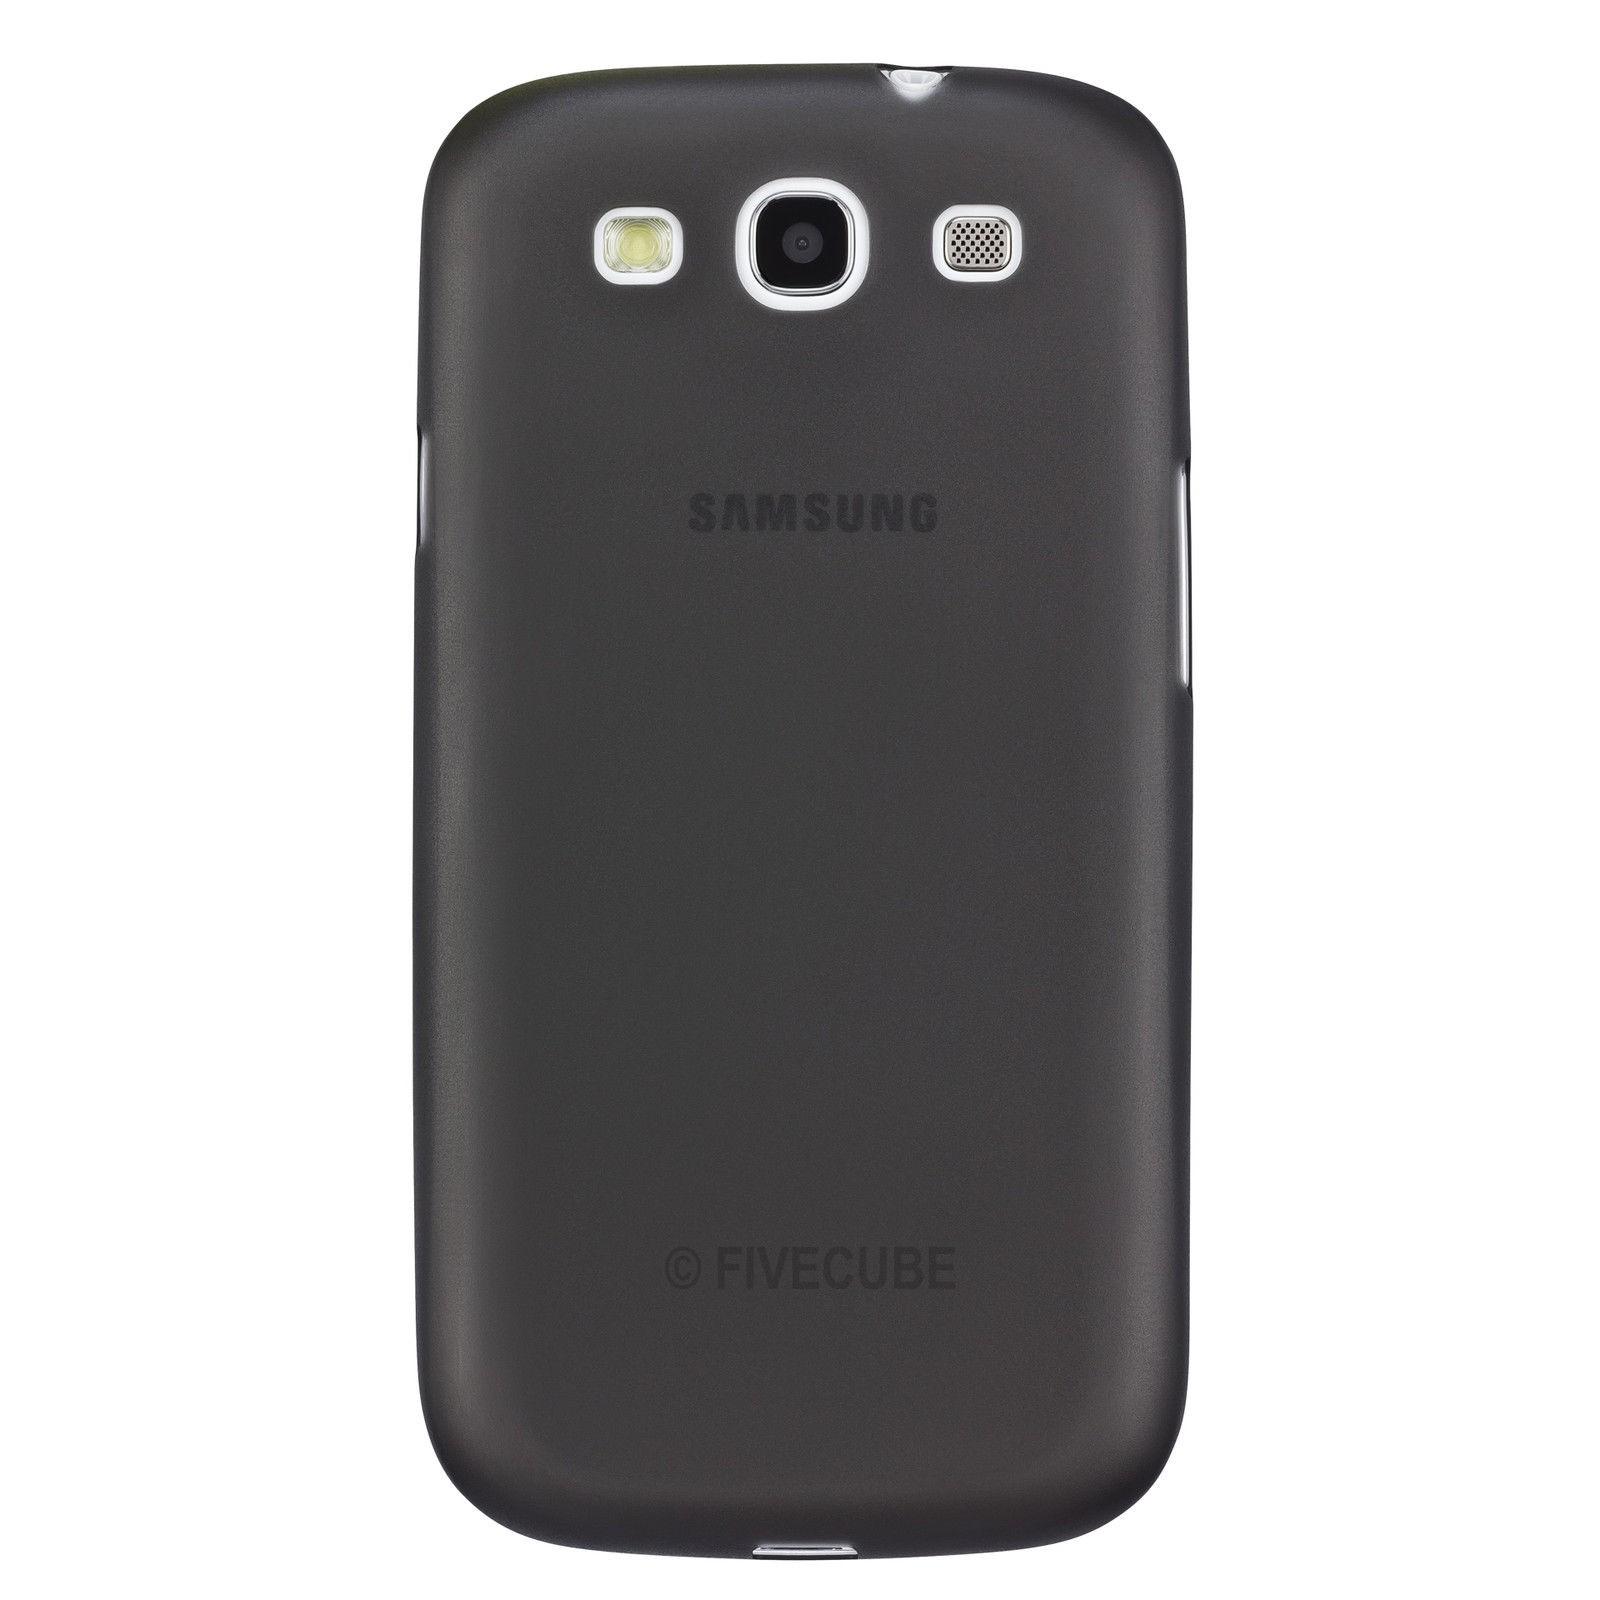 Ultra-Slim Galaxy S3 i9300 SlimCase Schutz Hülle HardCase Cover Bumper Tasche